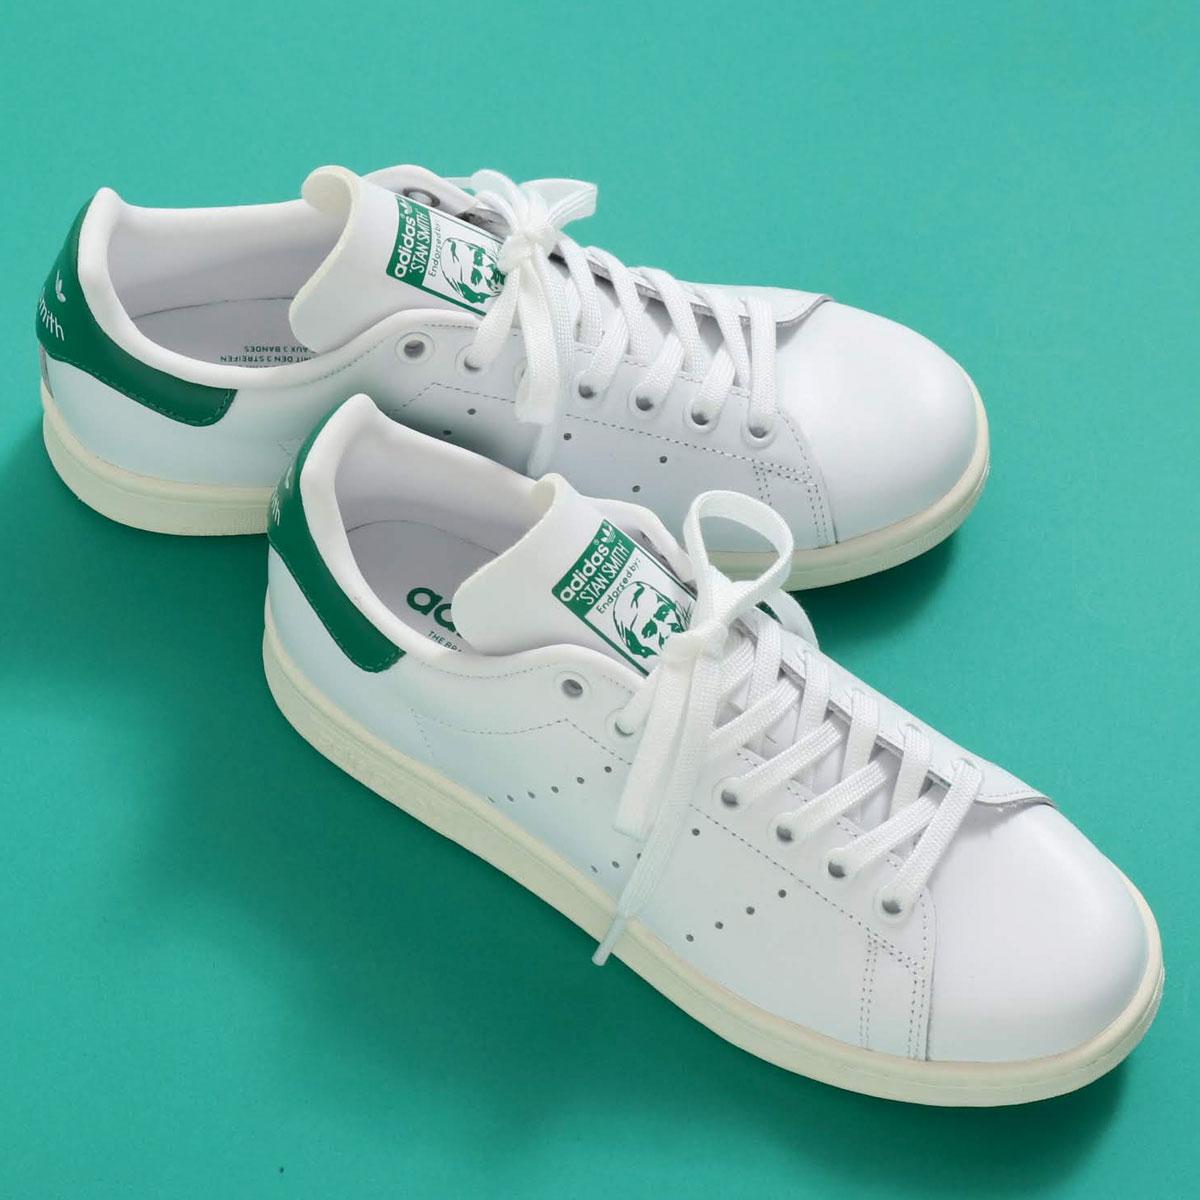 adidas Originals STAN SMITH(アディダスオリジナルス スタンスミス)RUNNING WHITE/OFF WHITE/BOLD GREEN【メンズ レディース スニーカー】19SS-I